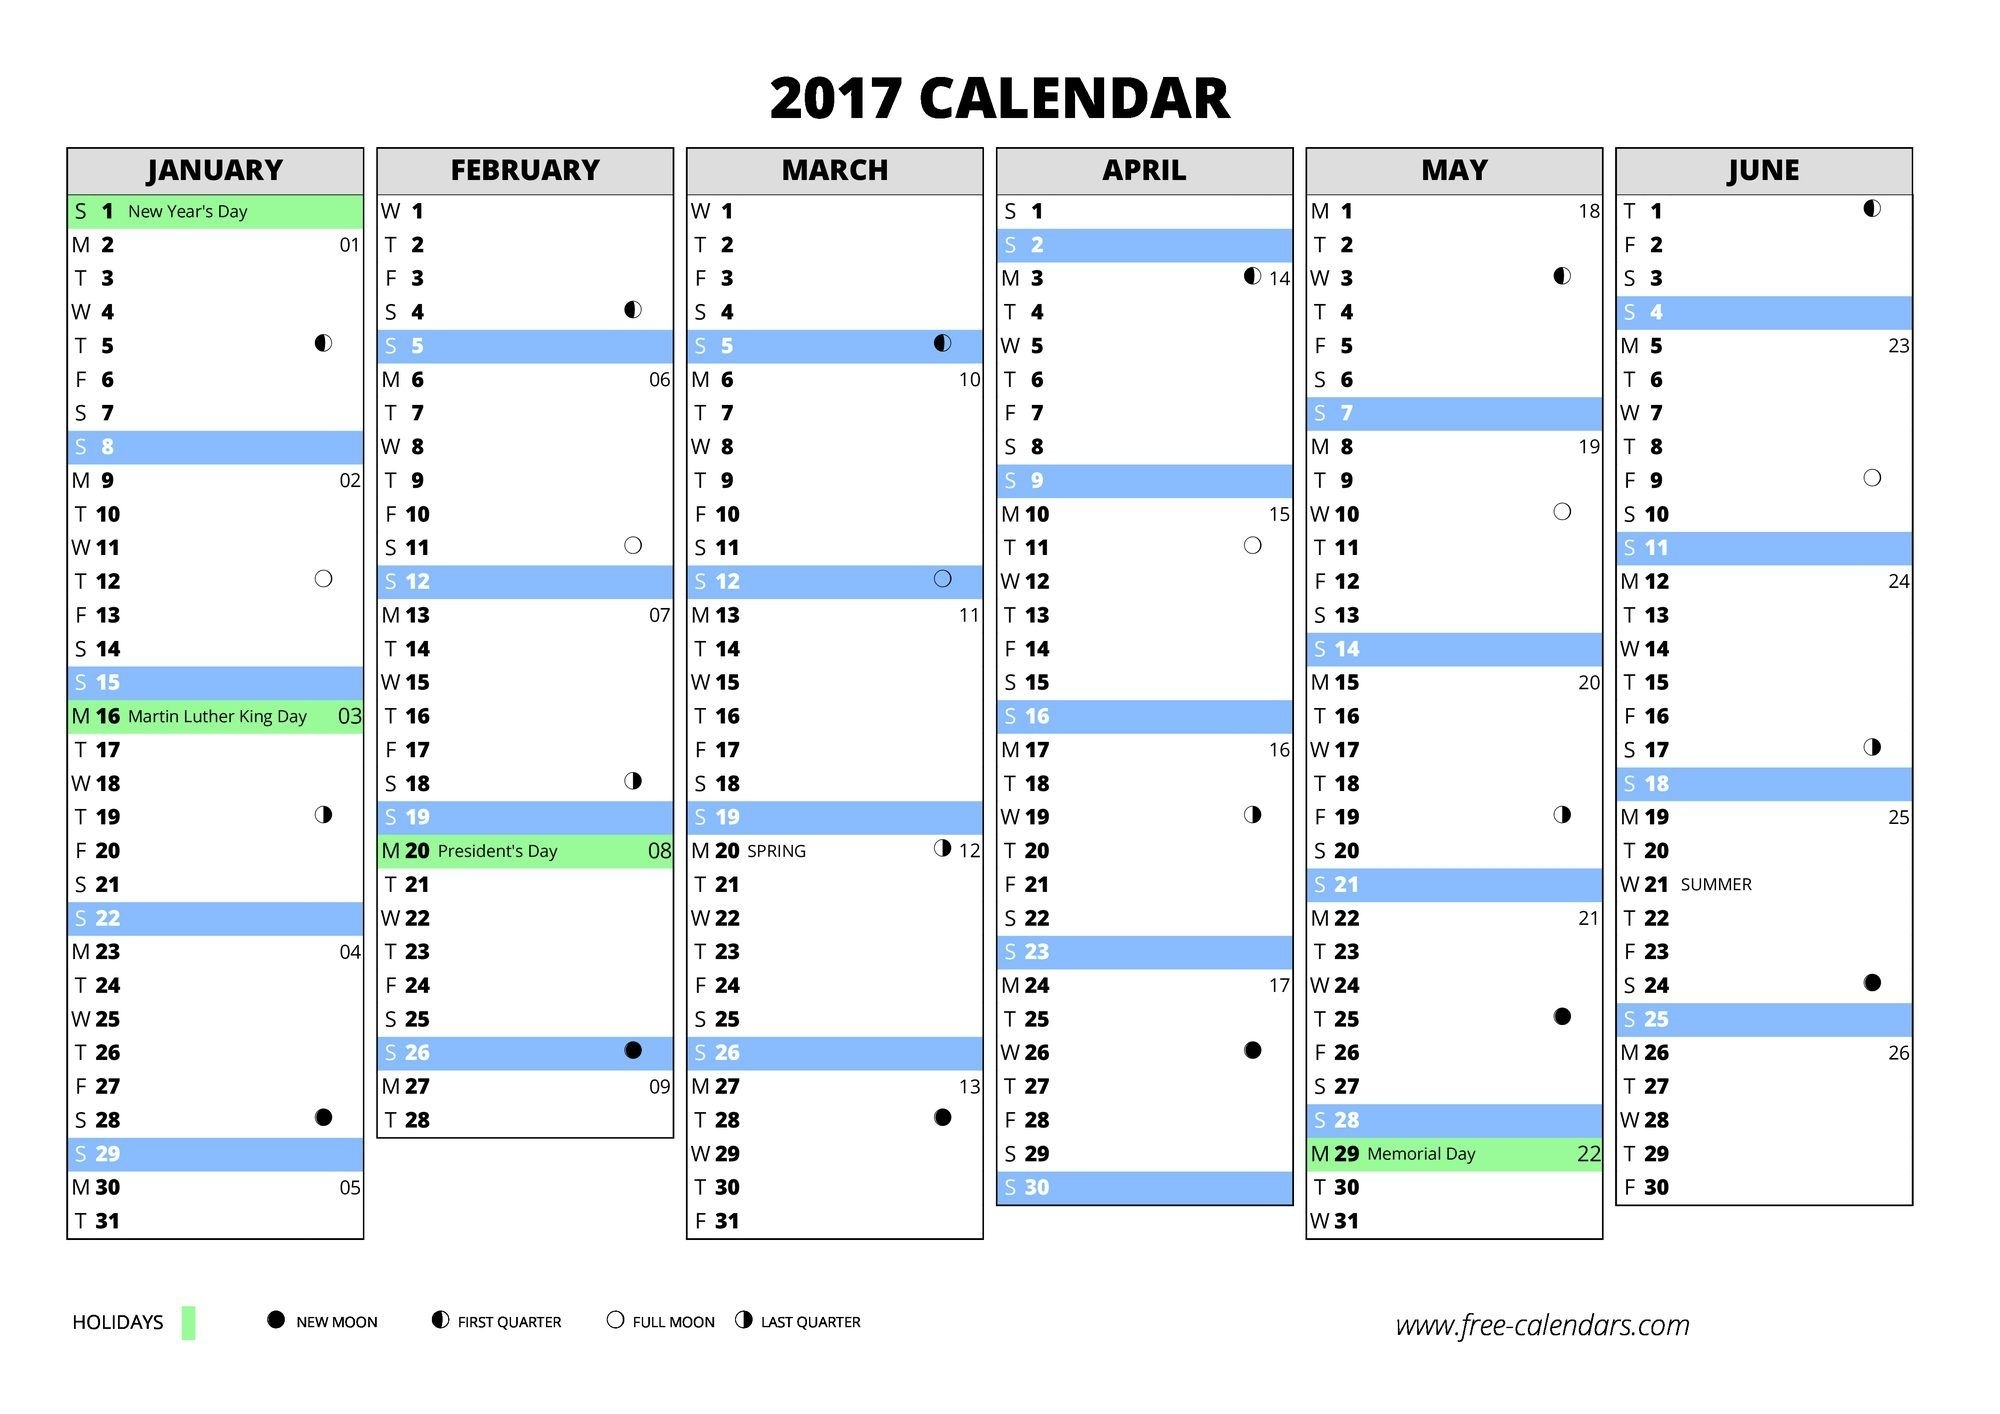 2017 Calendar ≡ Free-Calendars